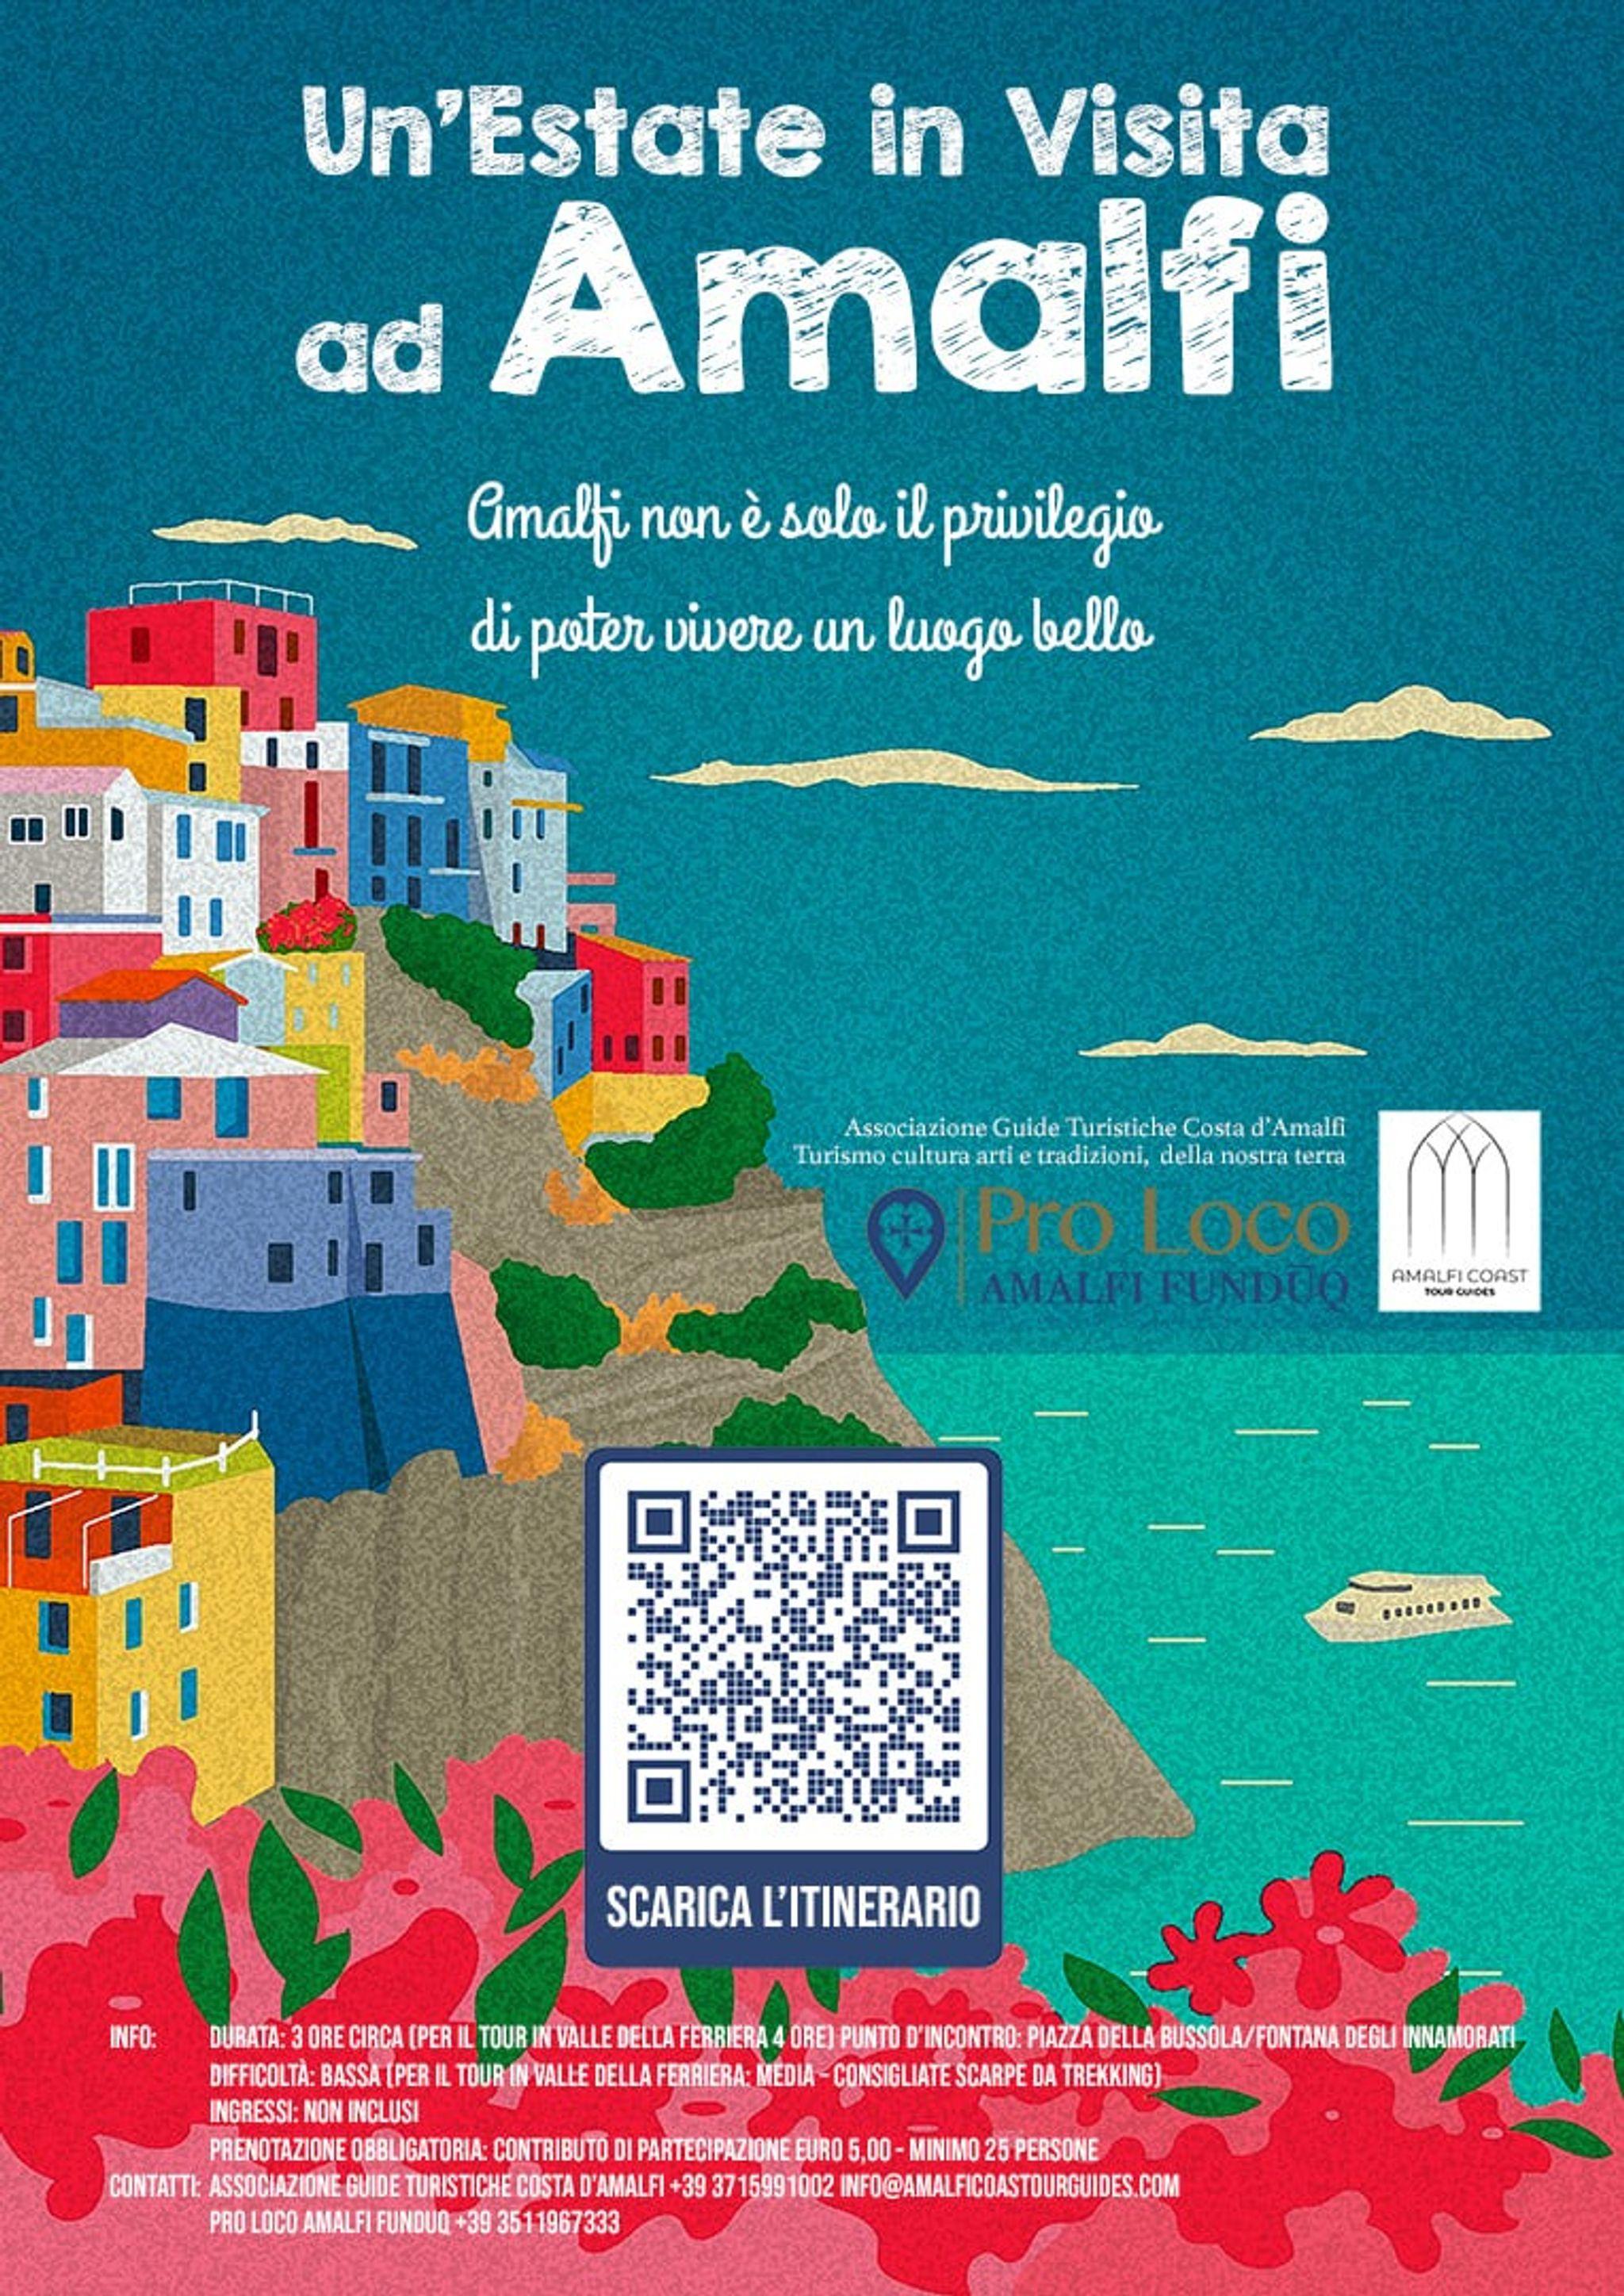 Amalfi and Atrani, sister cities